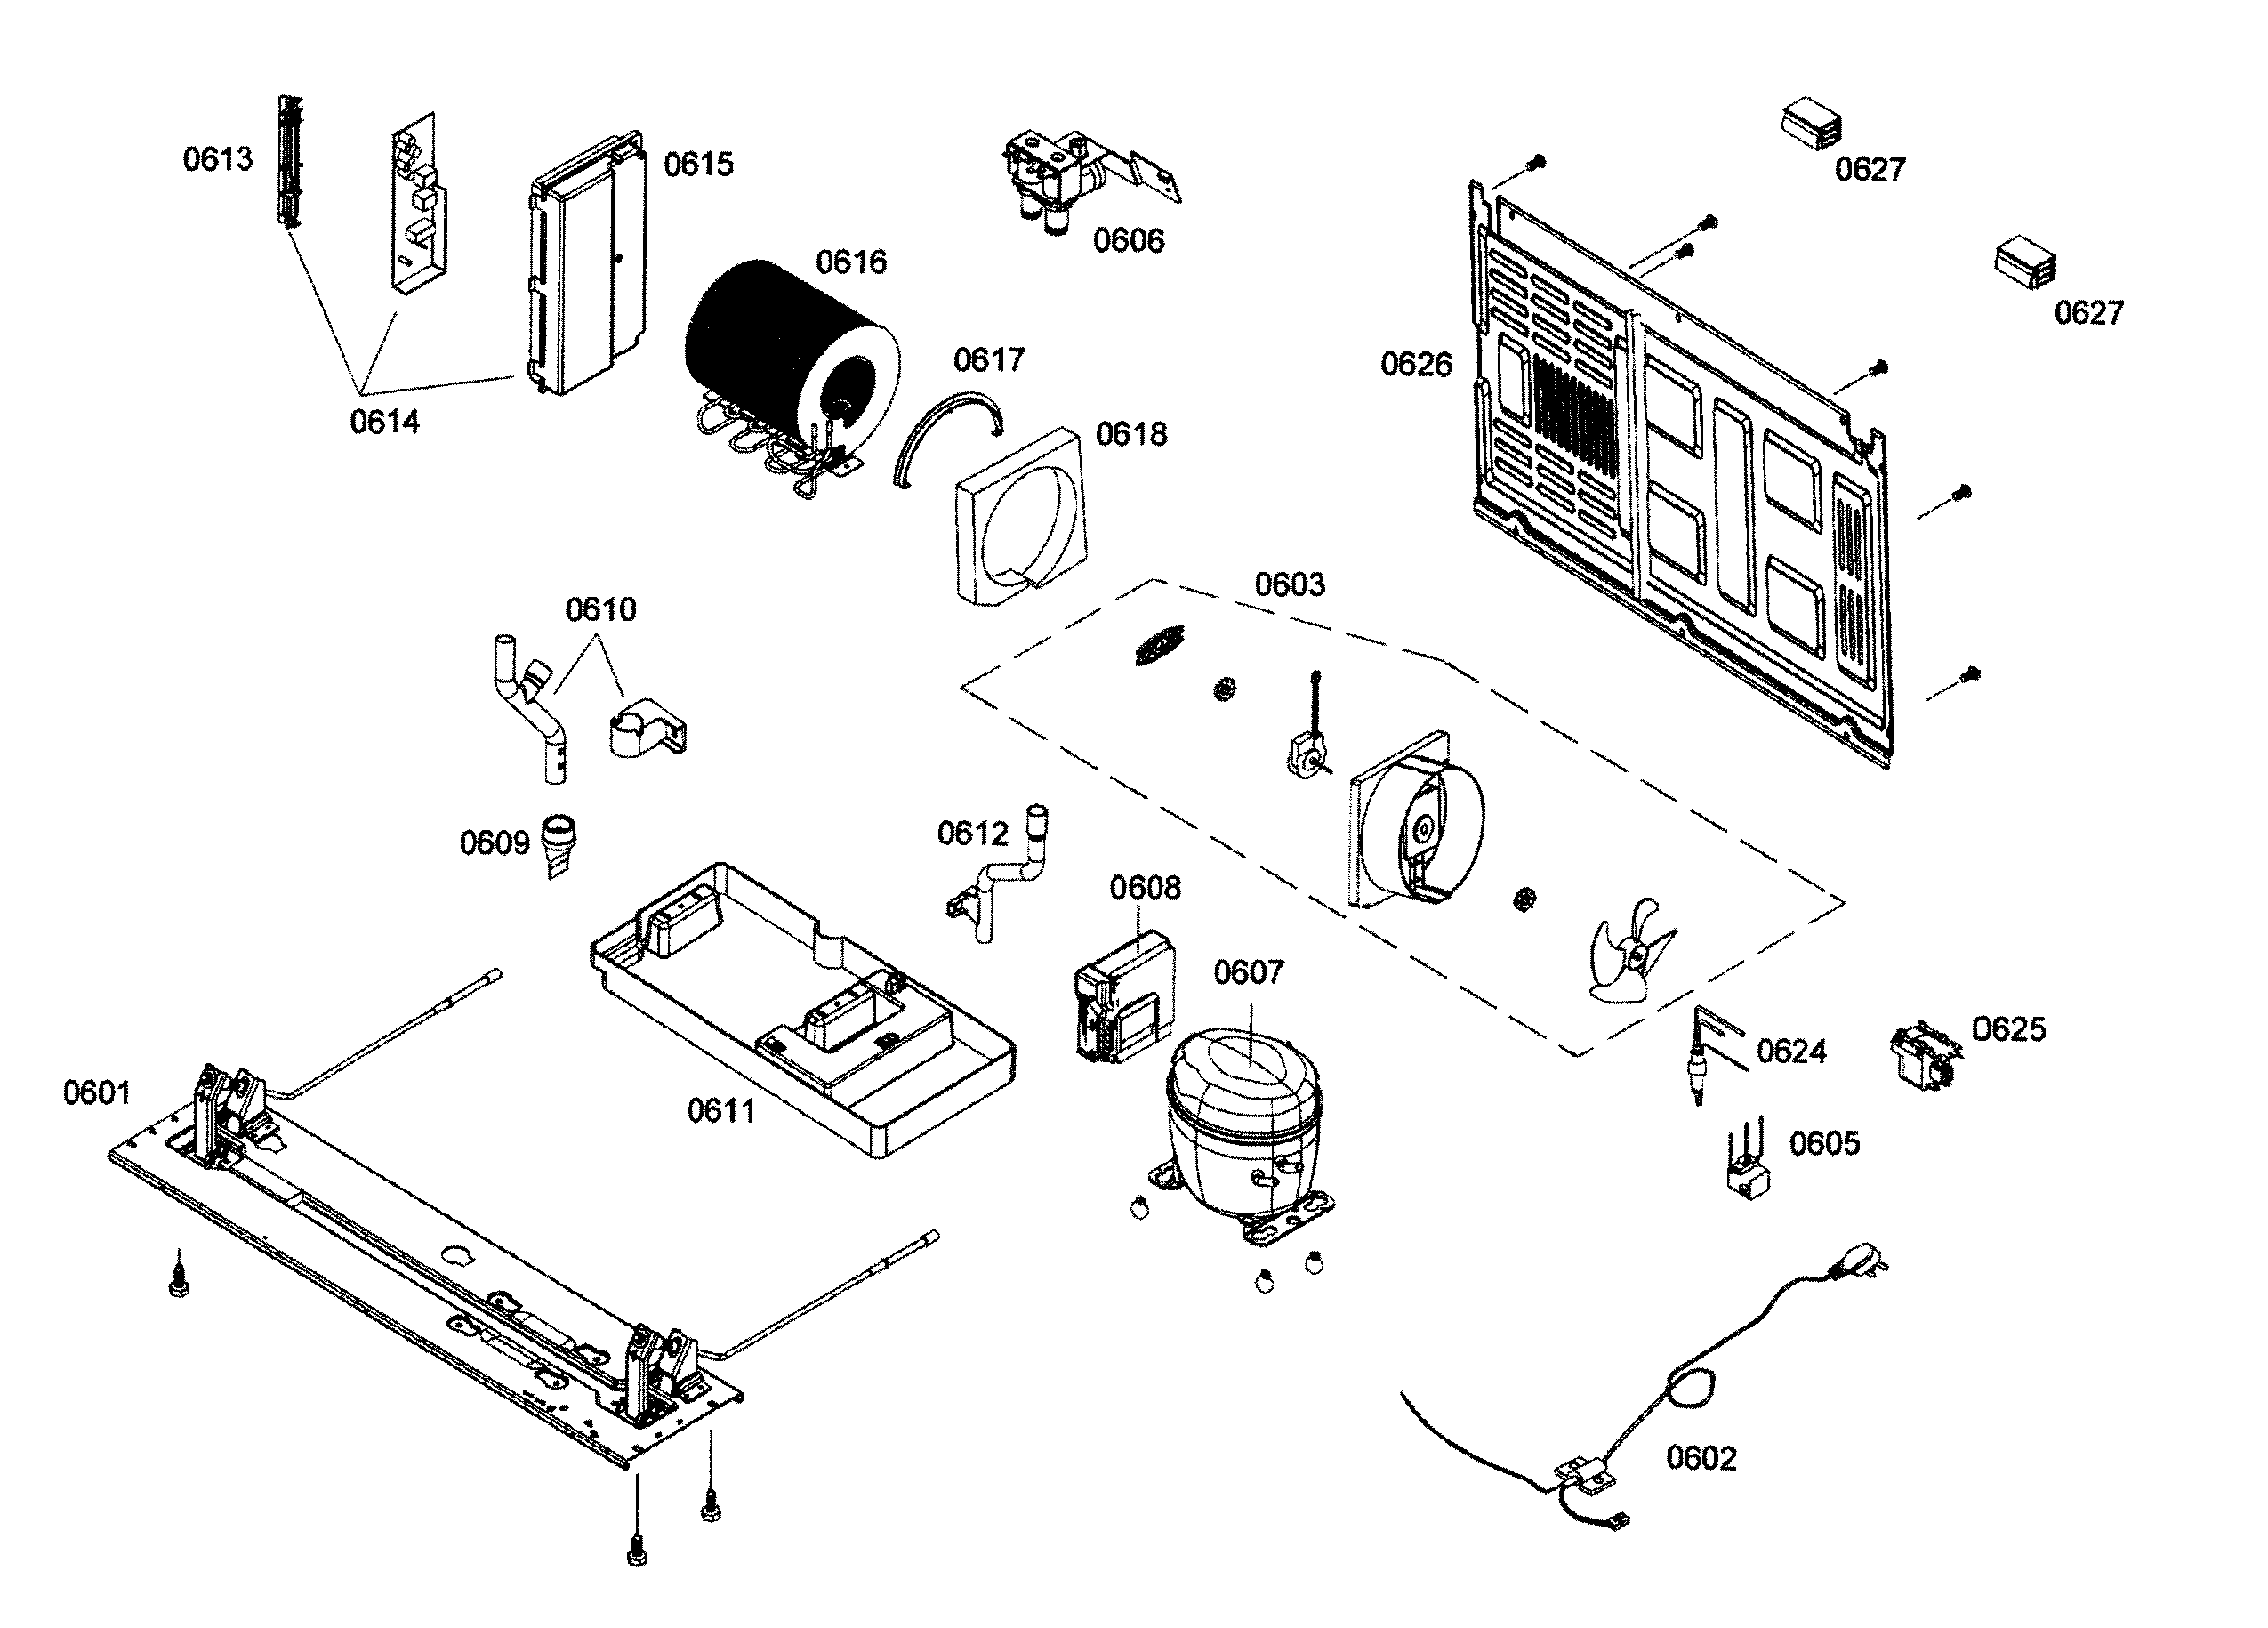 Bosch model B22CS30SNS/02 side-by-side refrigerator